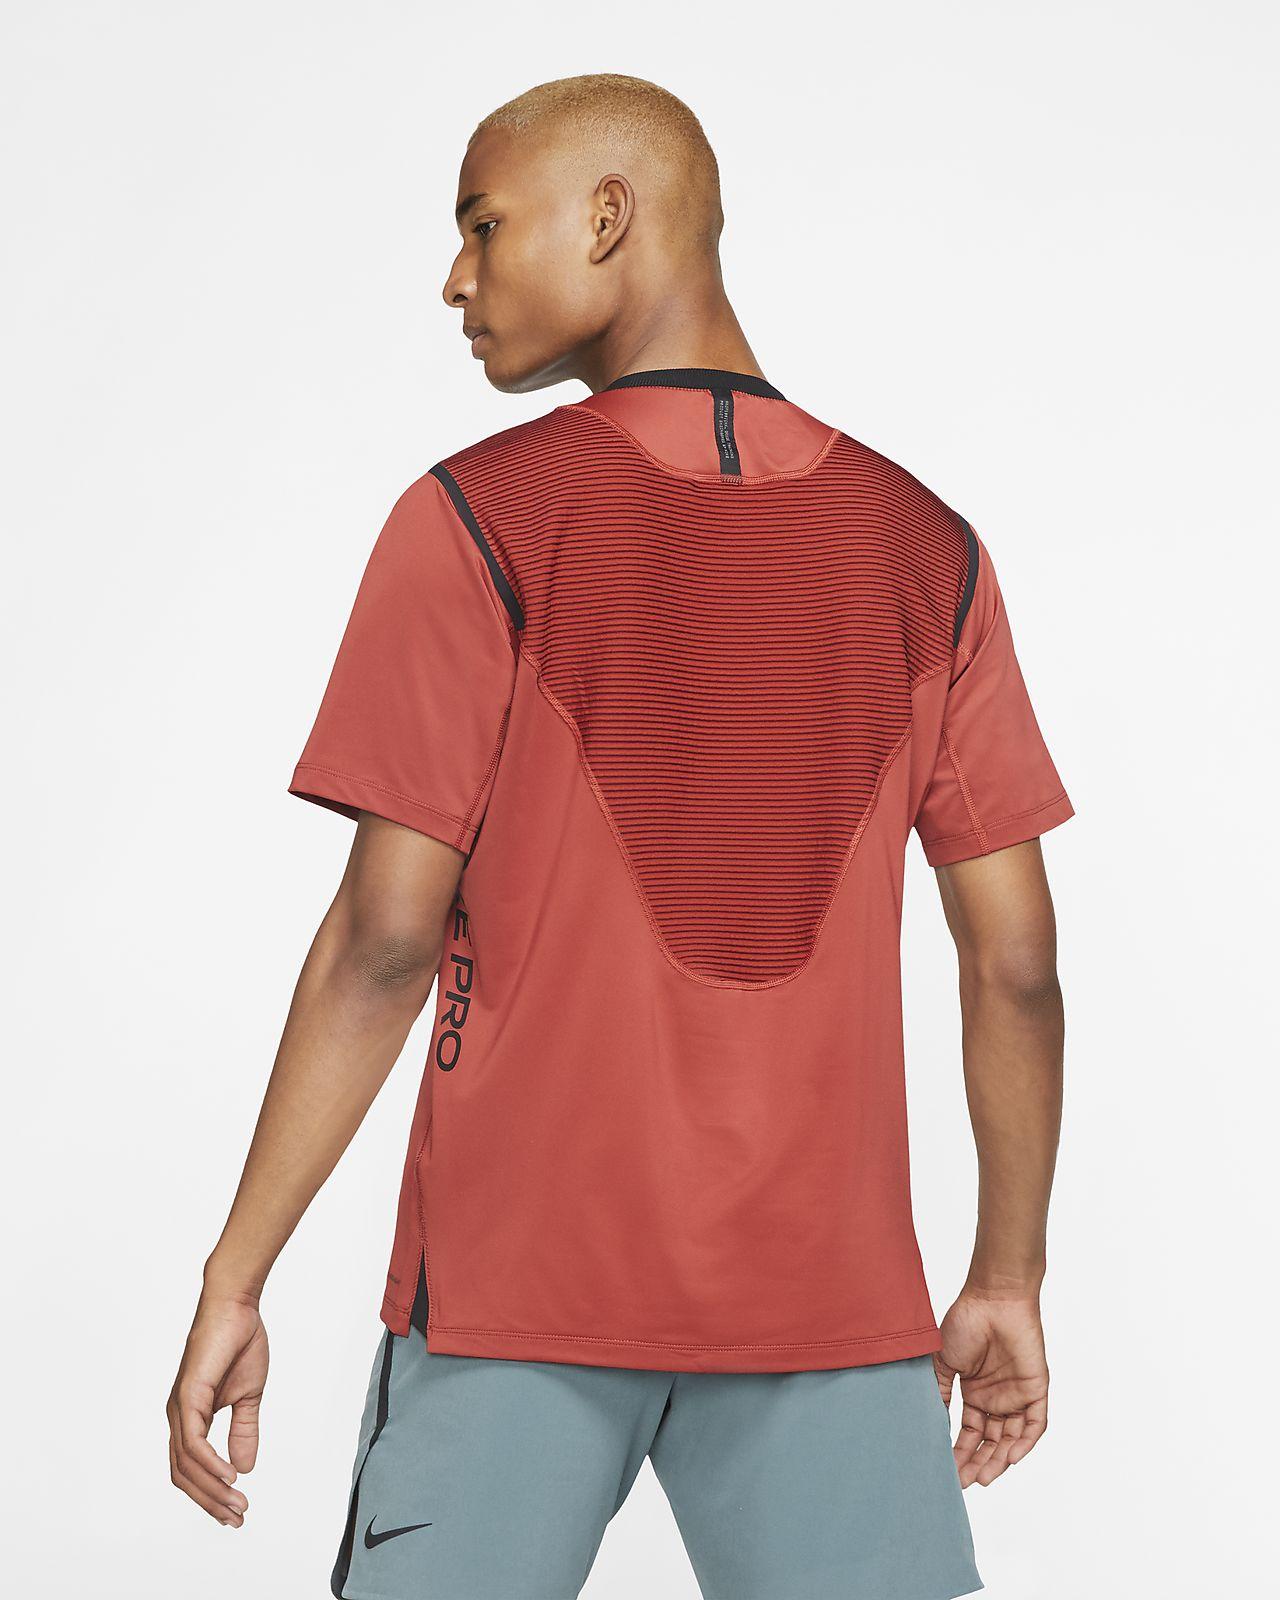 Camisola de manga curta Nike Pro AeroAdapt para homem